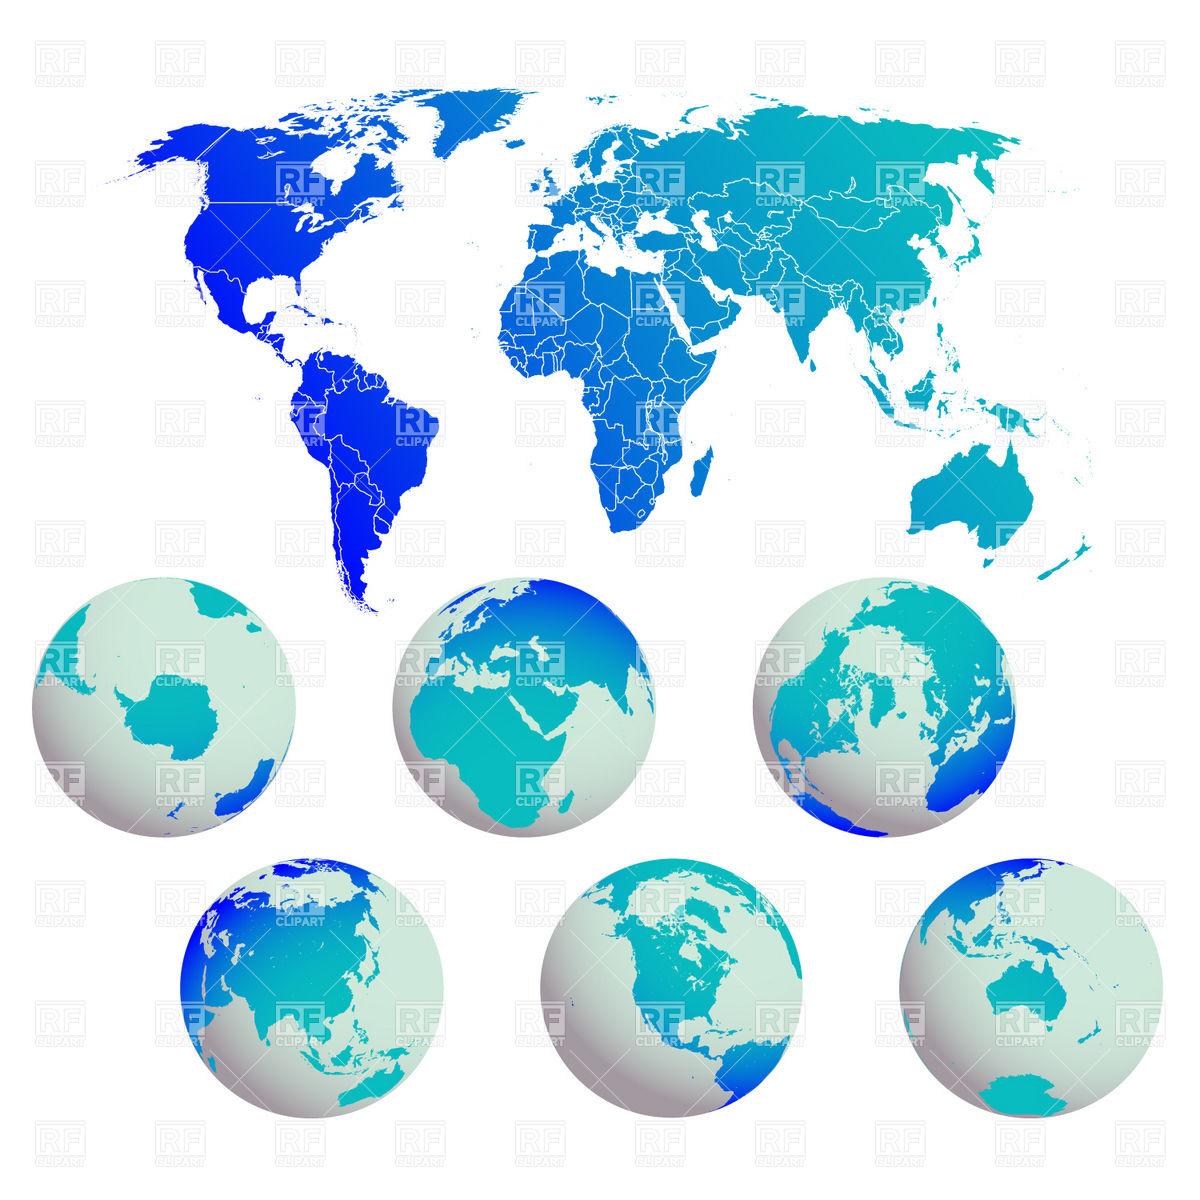 World map clipart uship clip art freeuse library World map two spheres clipart - ClipartFest clip art freeuse library